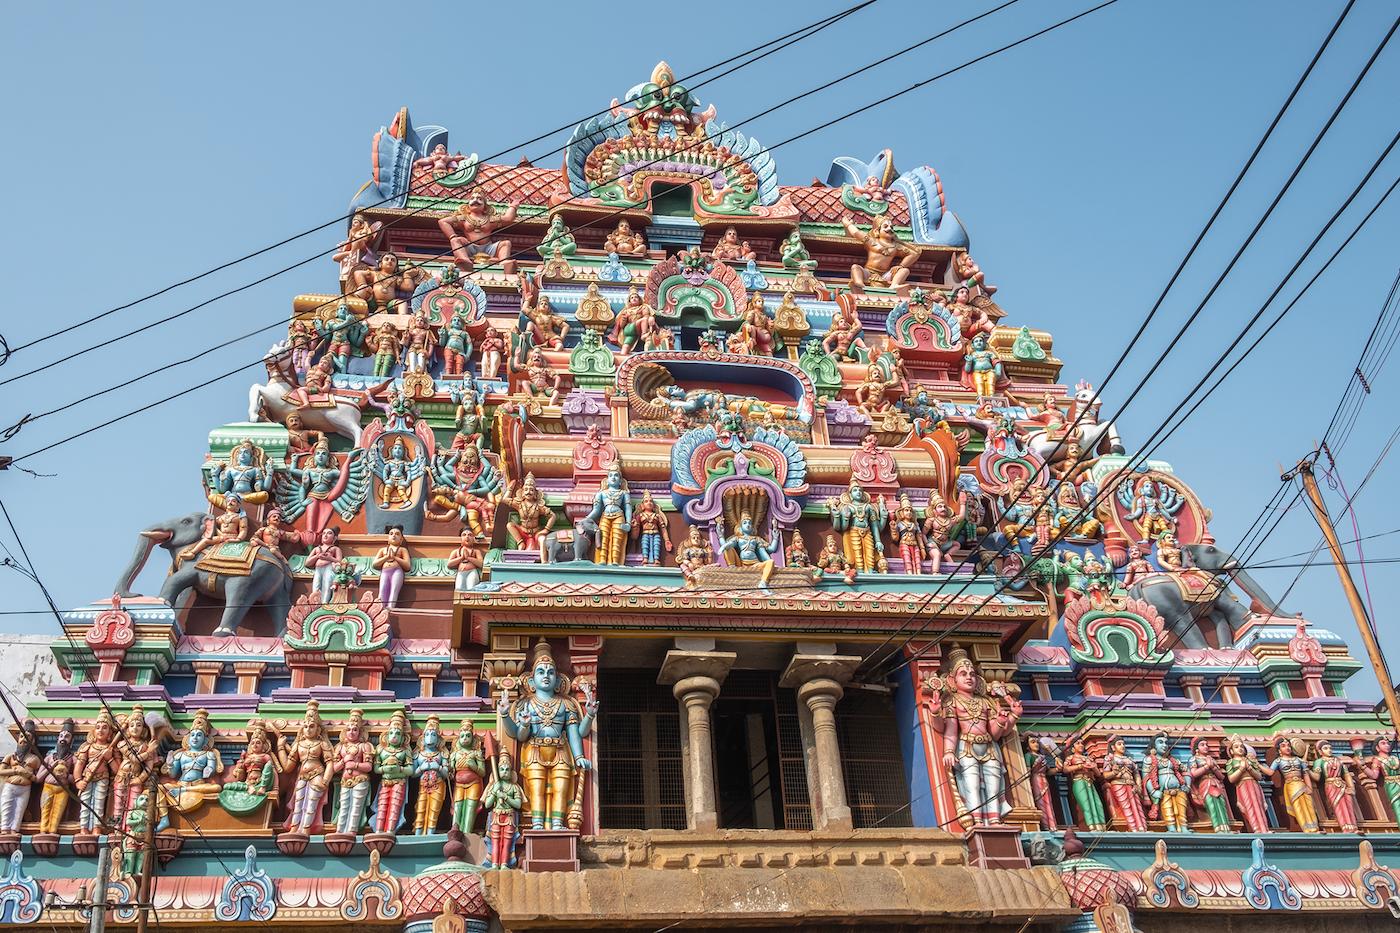 Reisadvies india tempels kleding